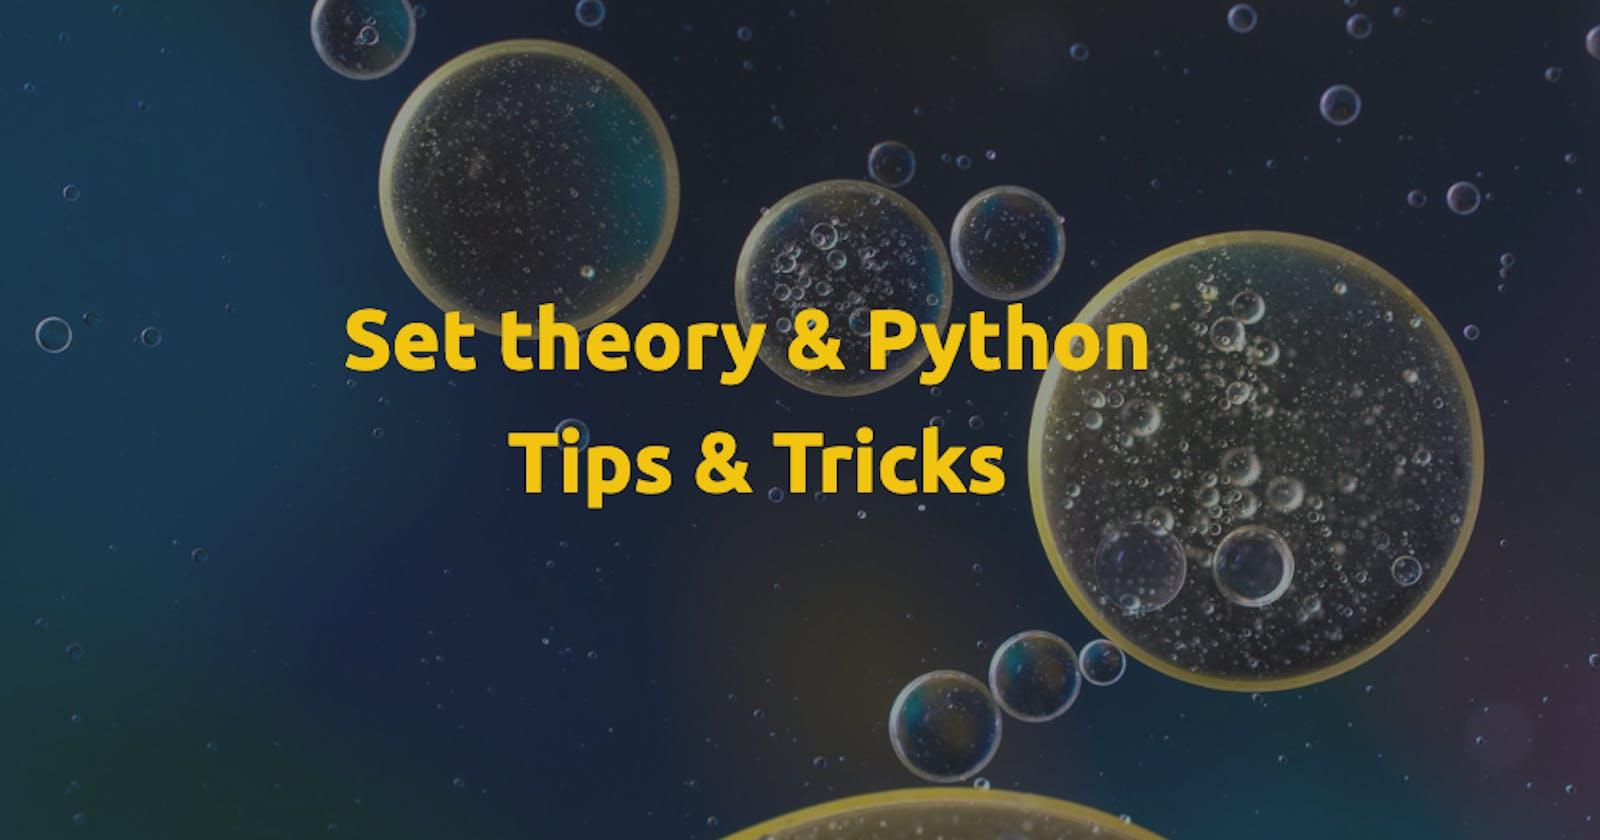 Set theory & Python + Tips & Tricks